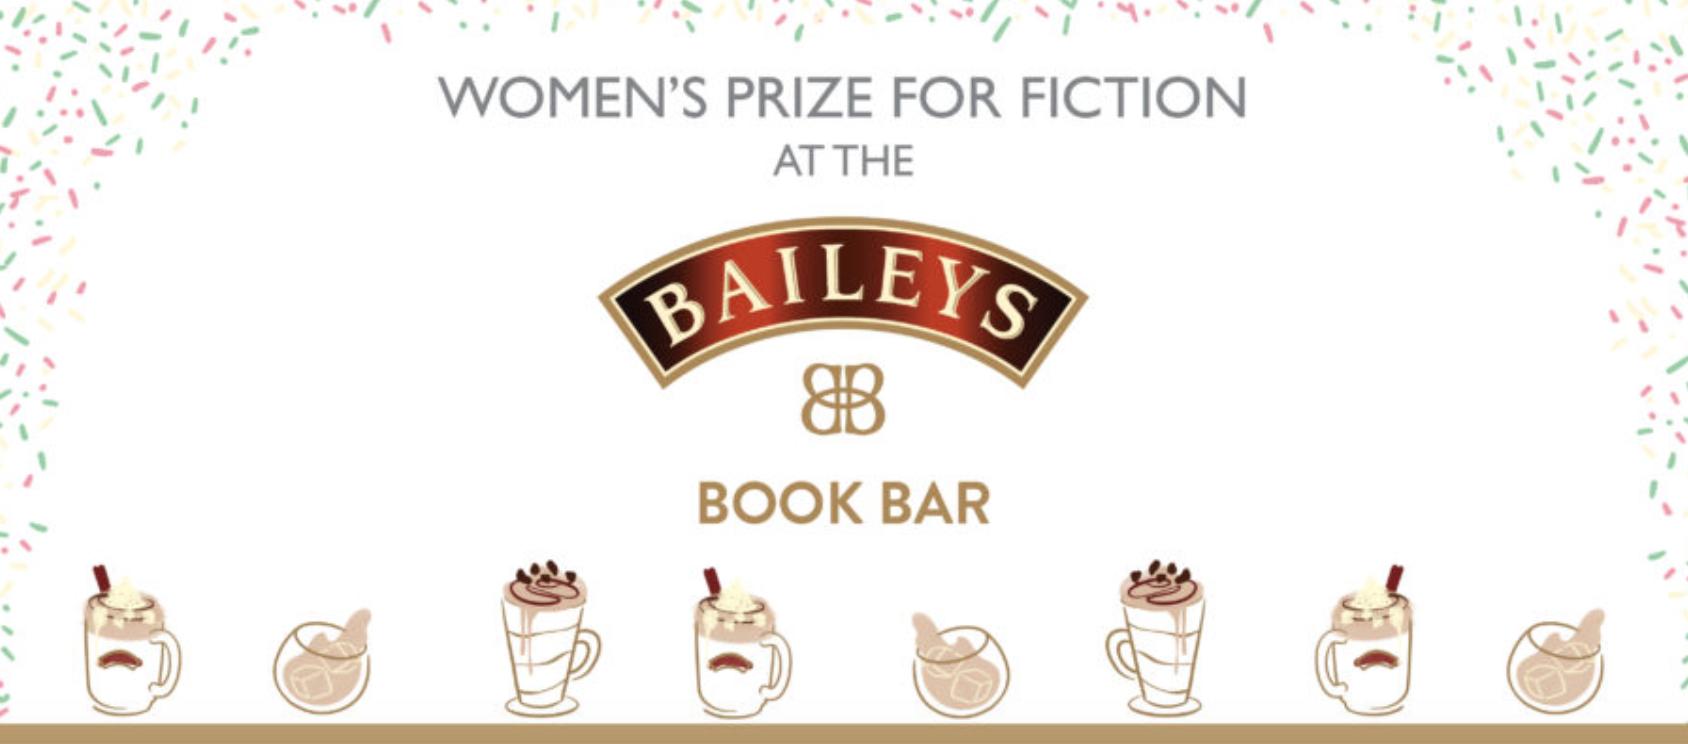 Baileys pop-up book bar